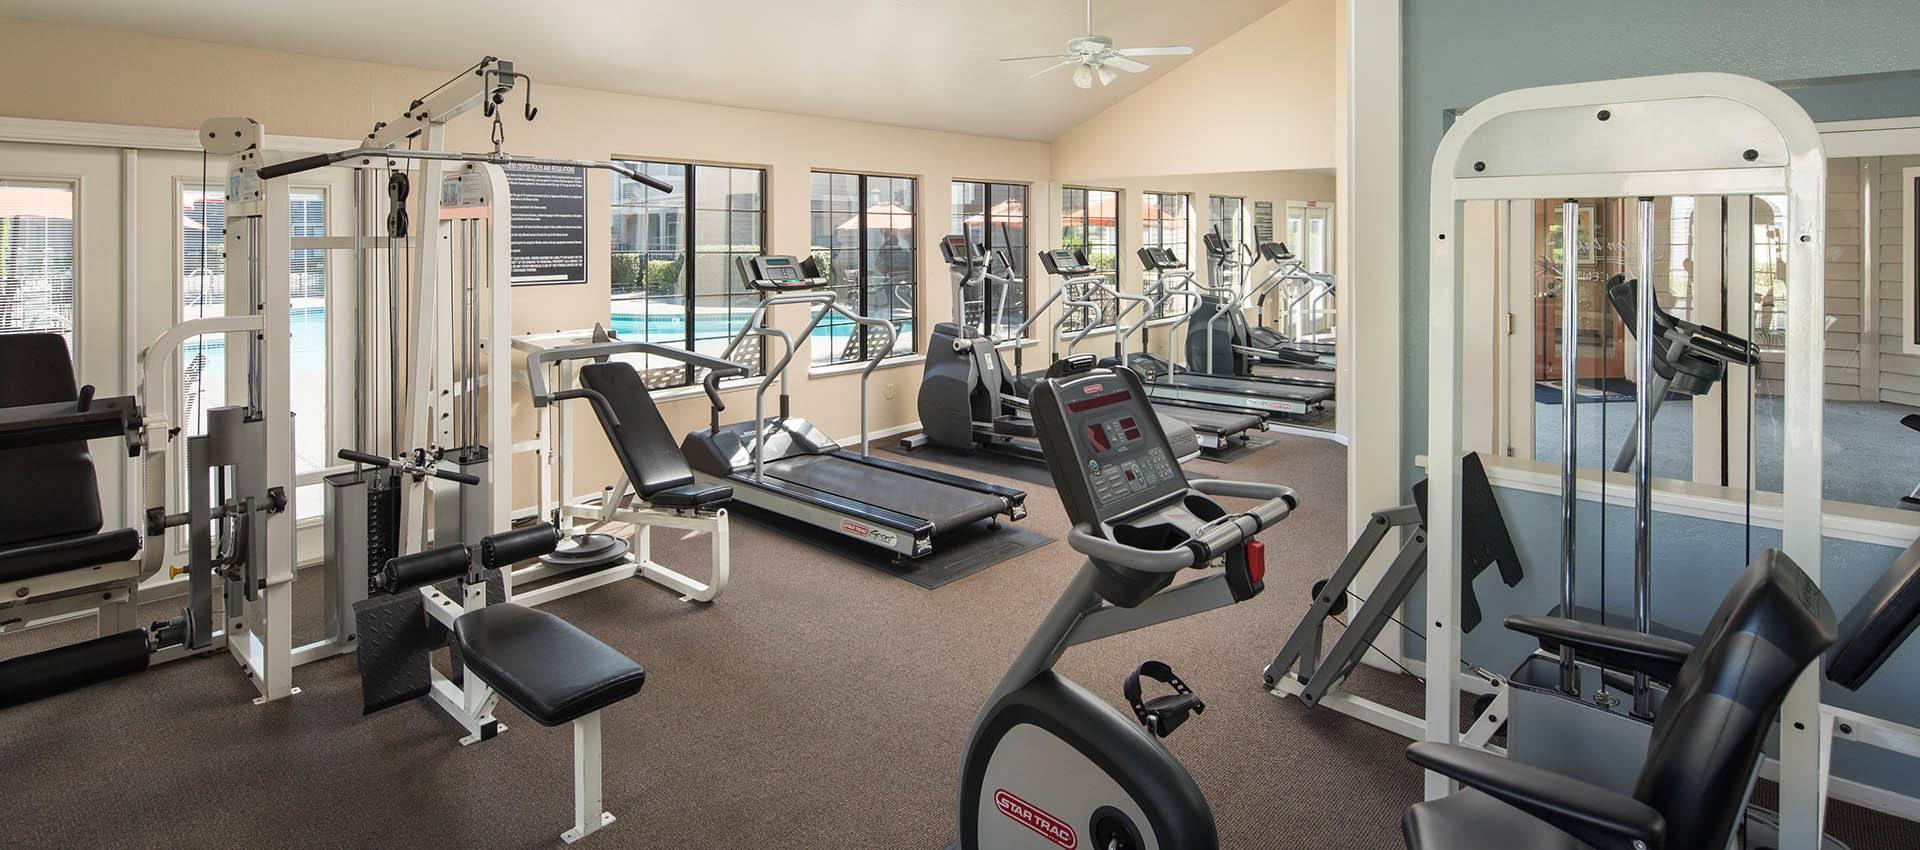 Resident's Fitness Center at Hidden Lake Condominium Rentals in Sacramento, California